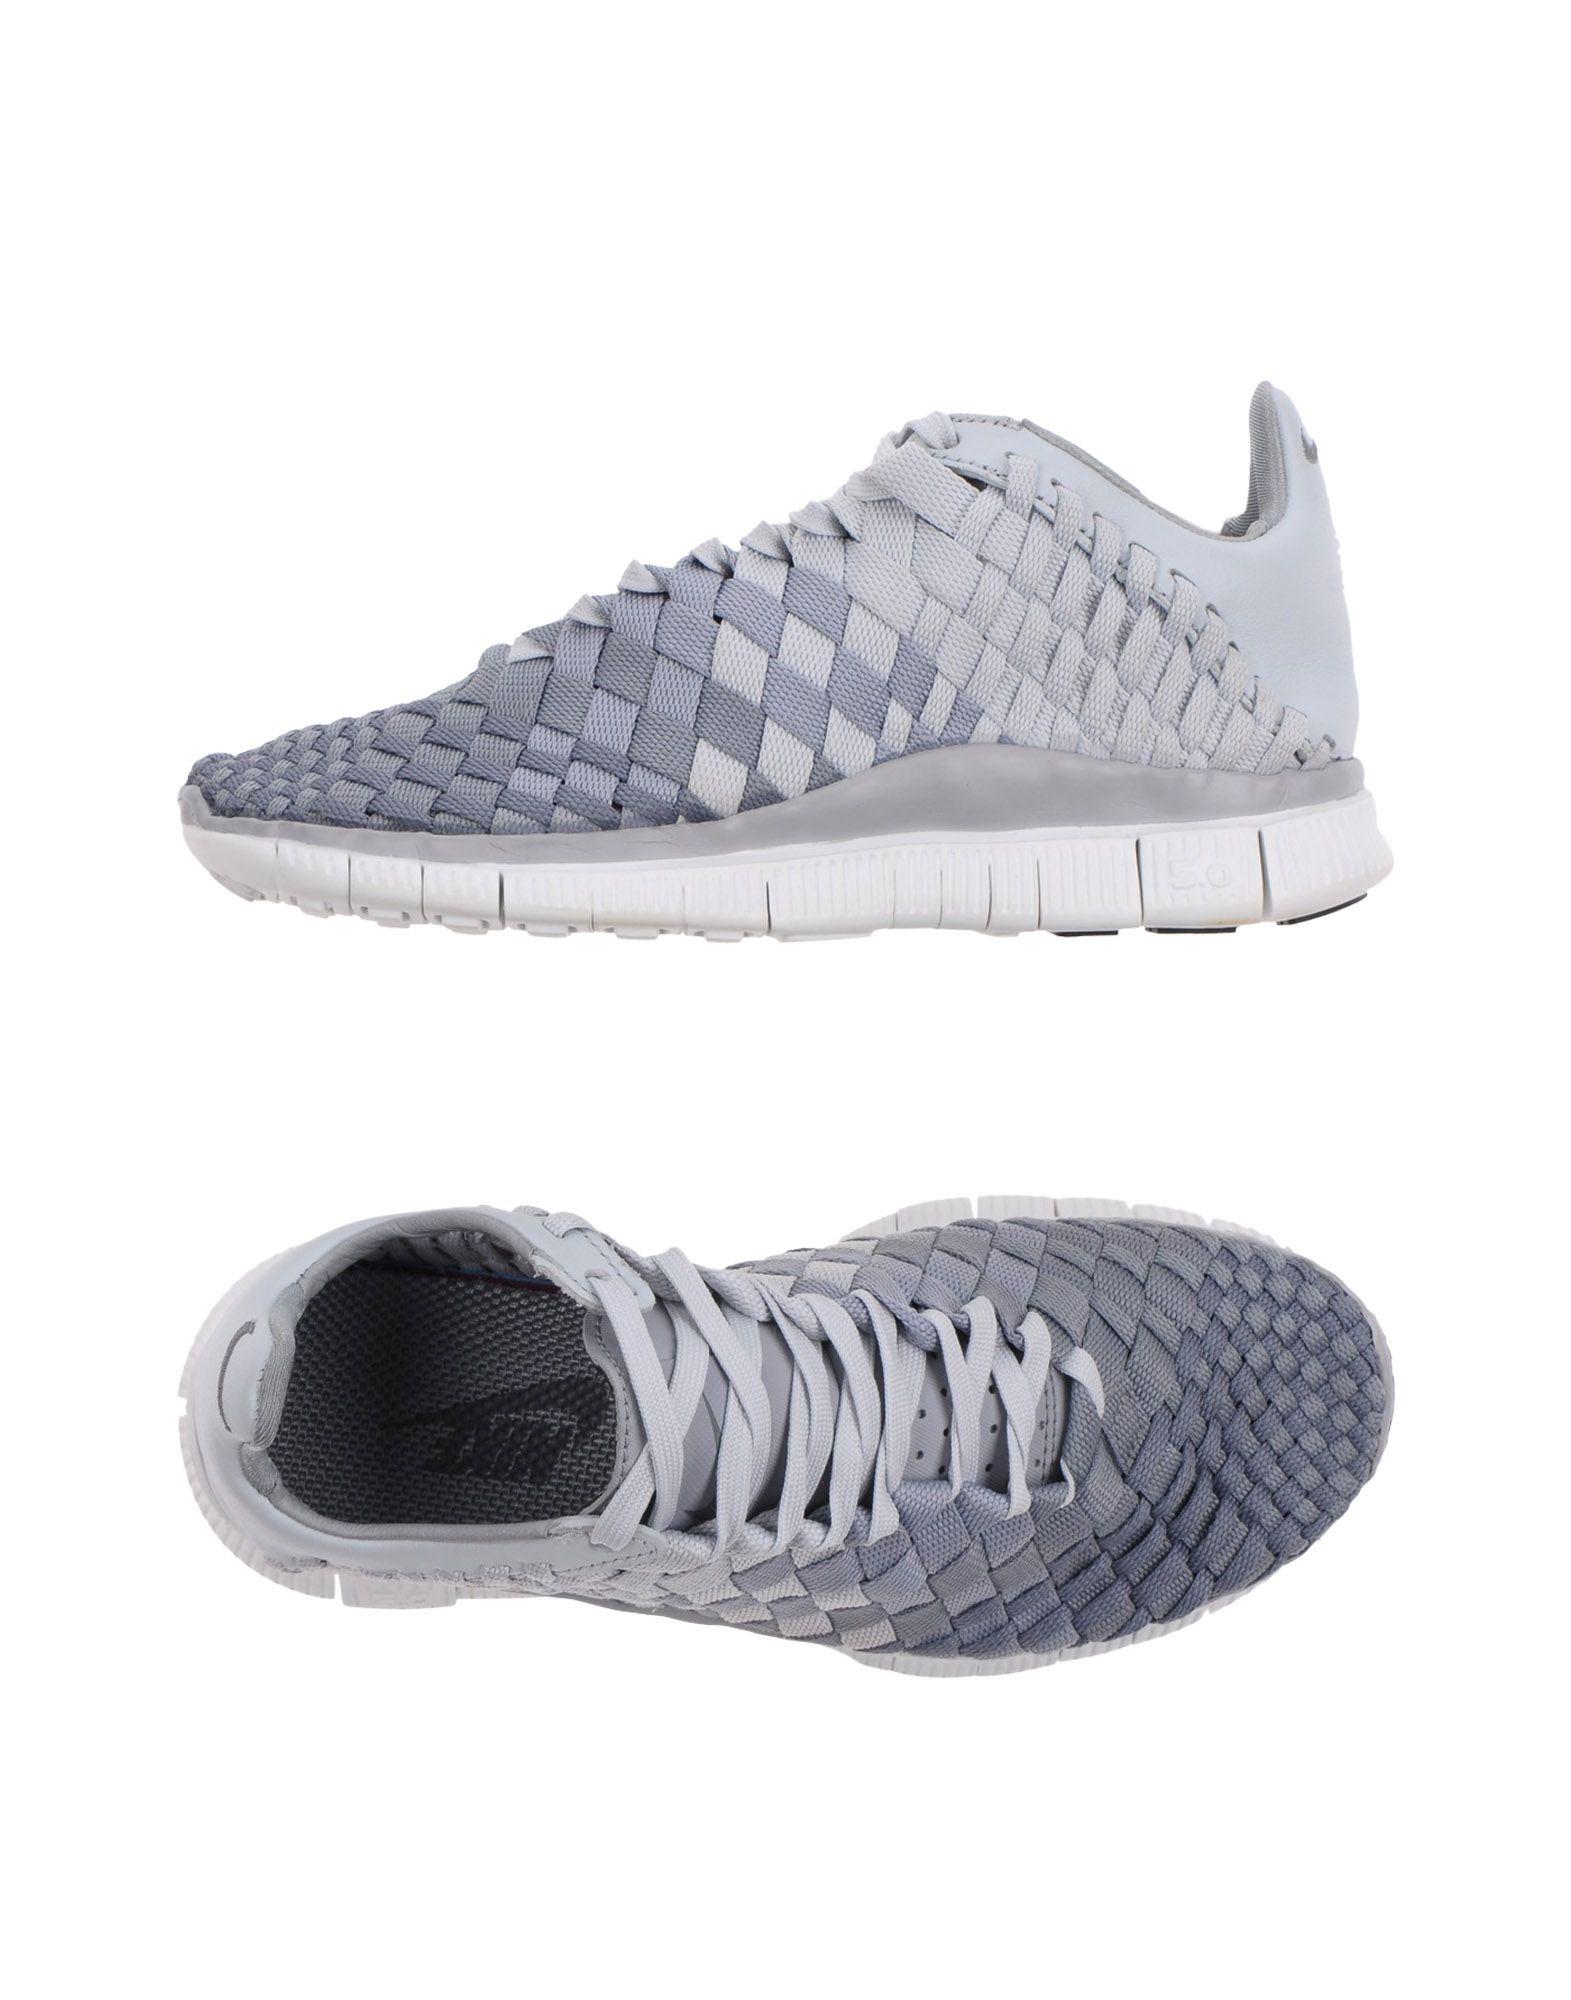 Sneakers Nike Scarpe Donna - 11357757KE Scarpe Nike comode e distintive a11e56